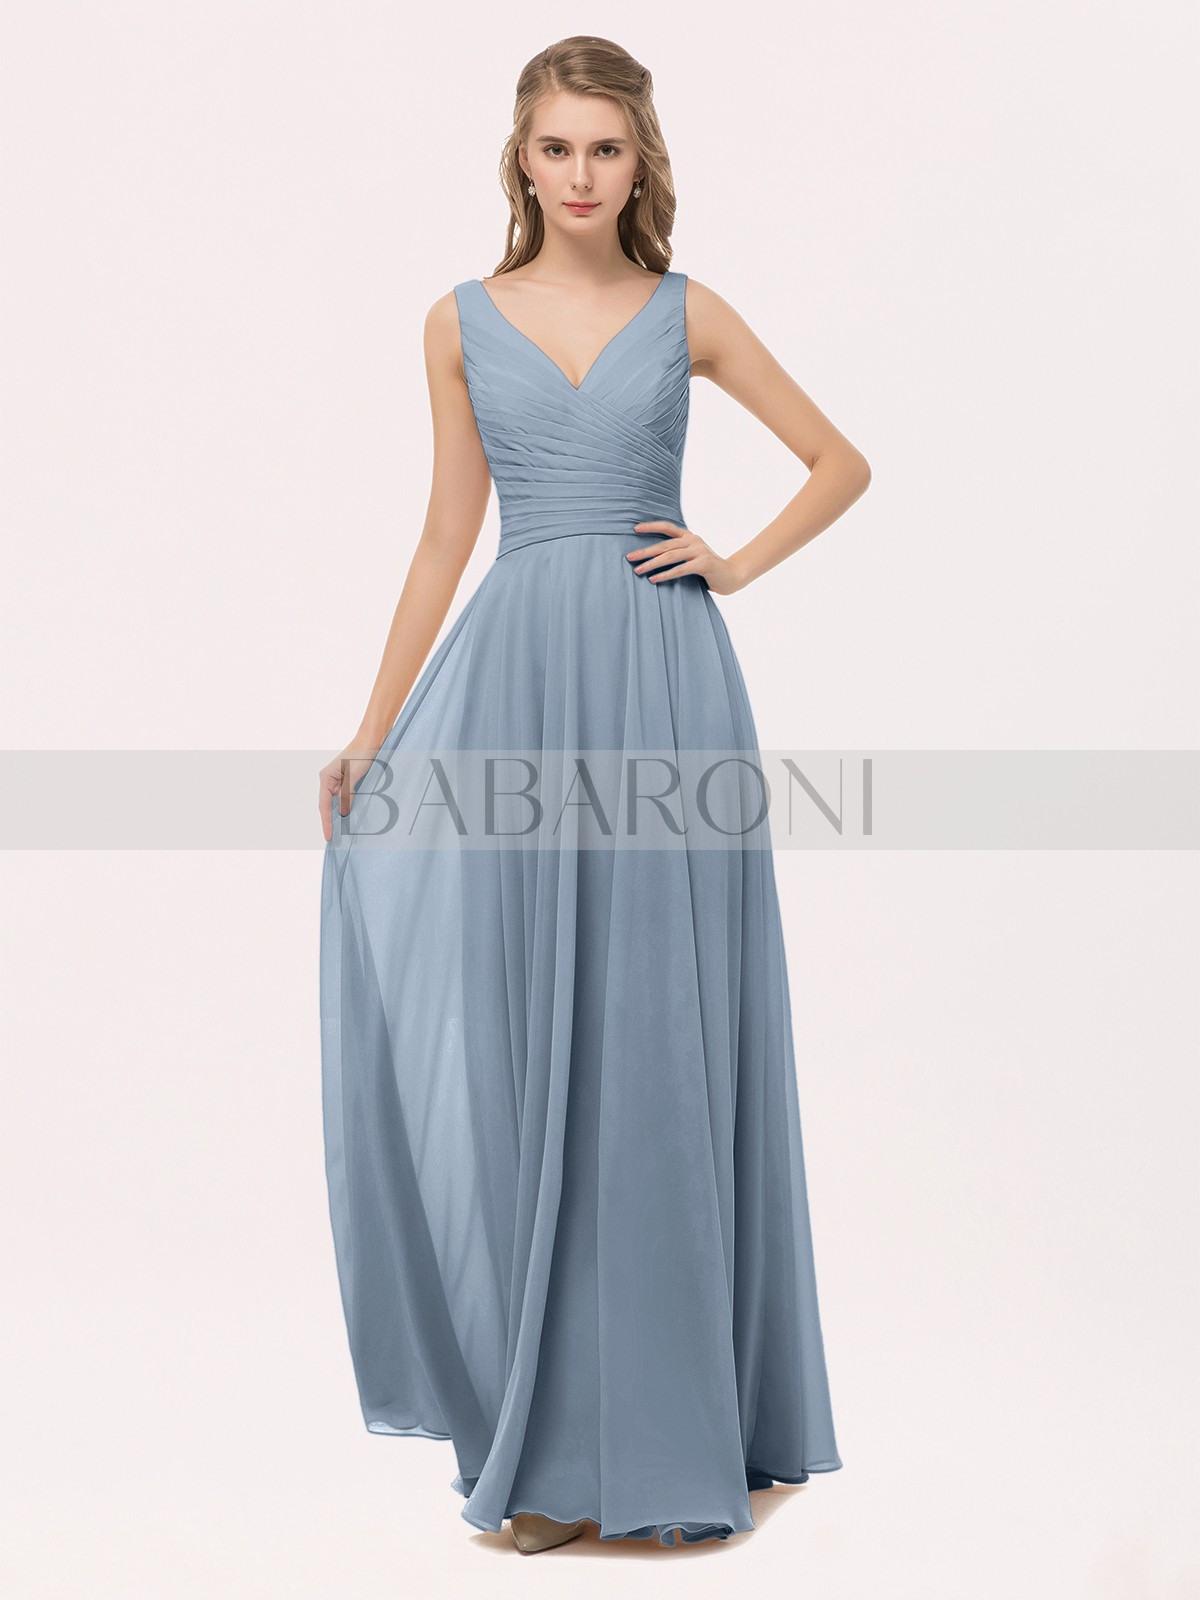 10 Einzigartig Abendkleid Lang Blau Ärmel15 Einzigartig Abendkleid Lang Blau Design